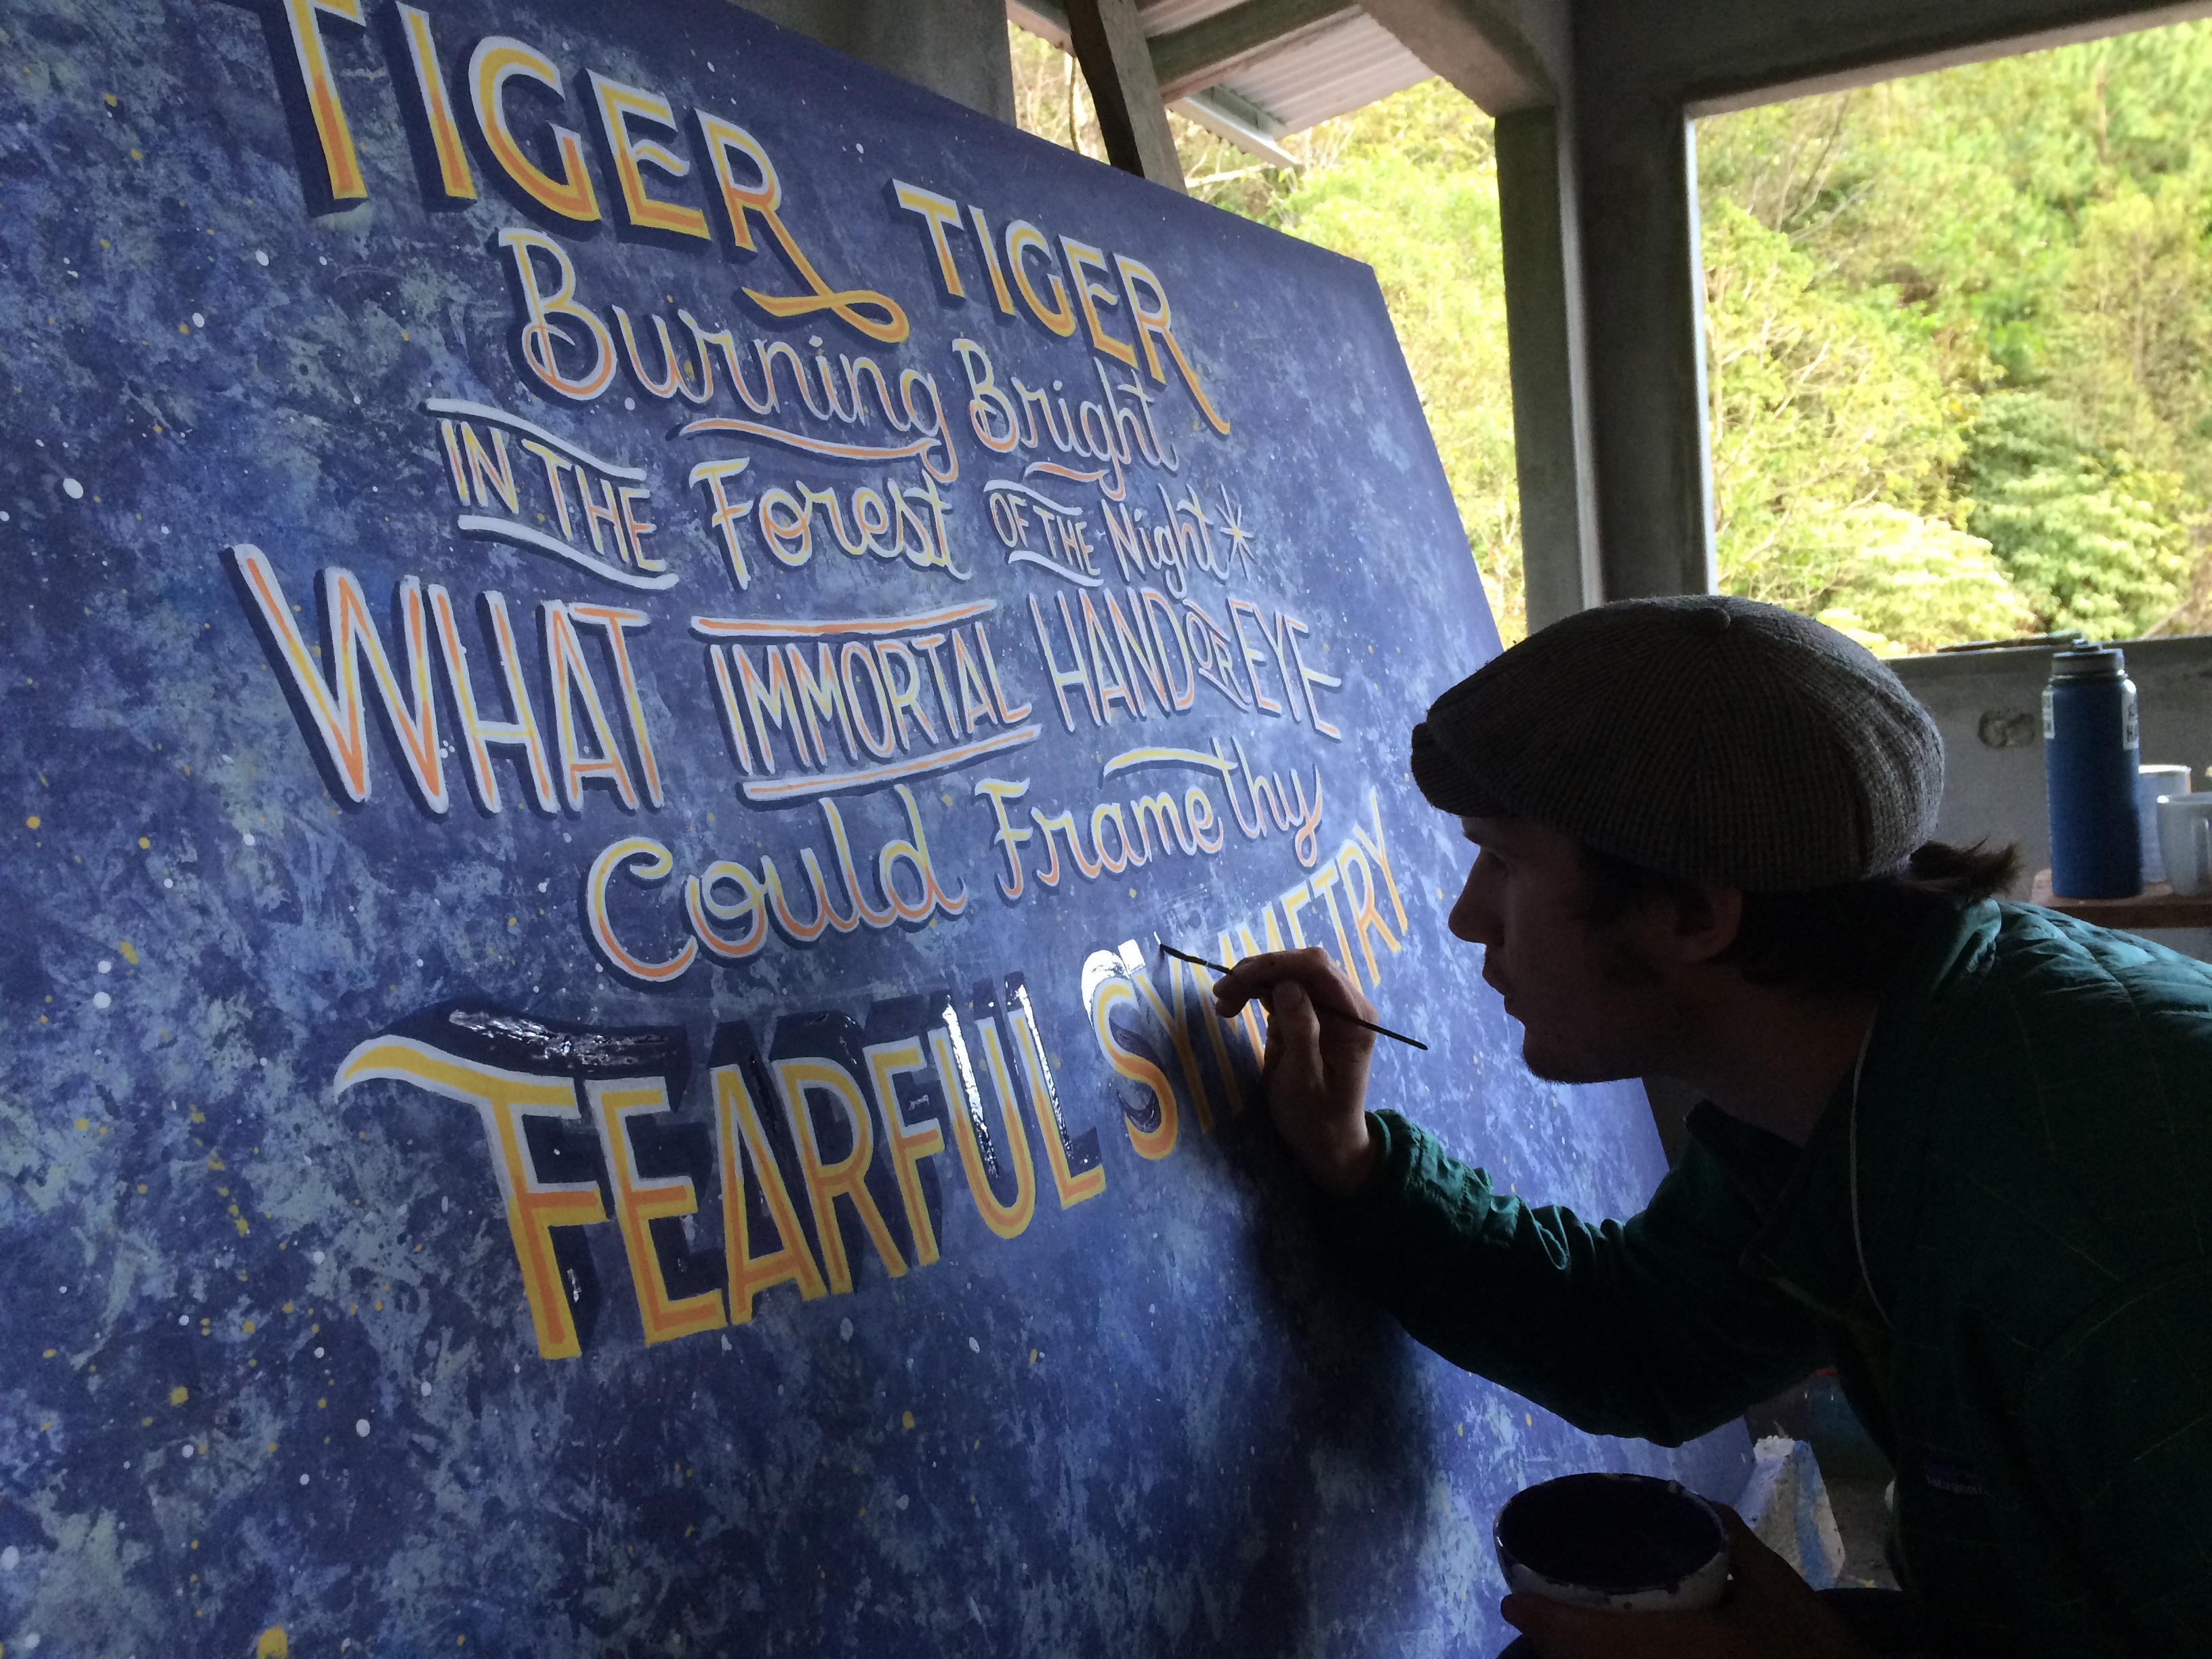 Tiger Tiger (Process)